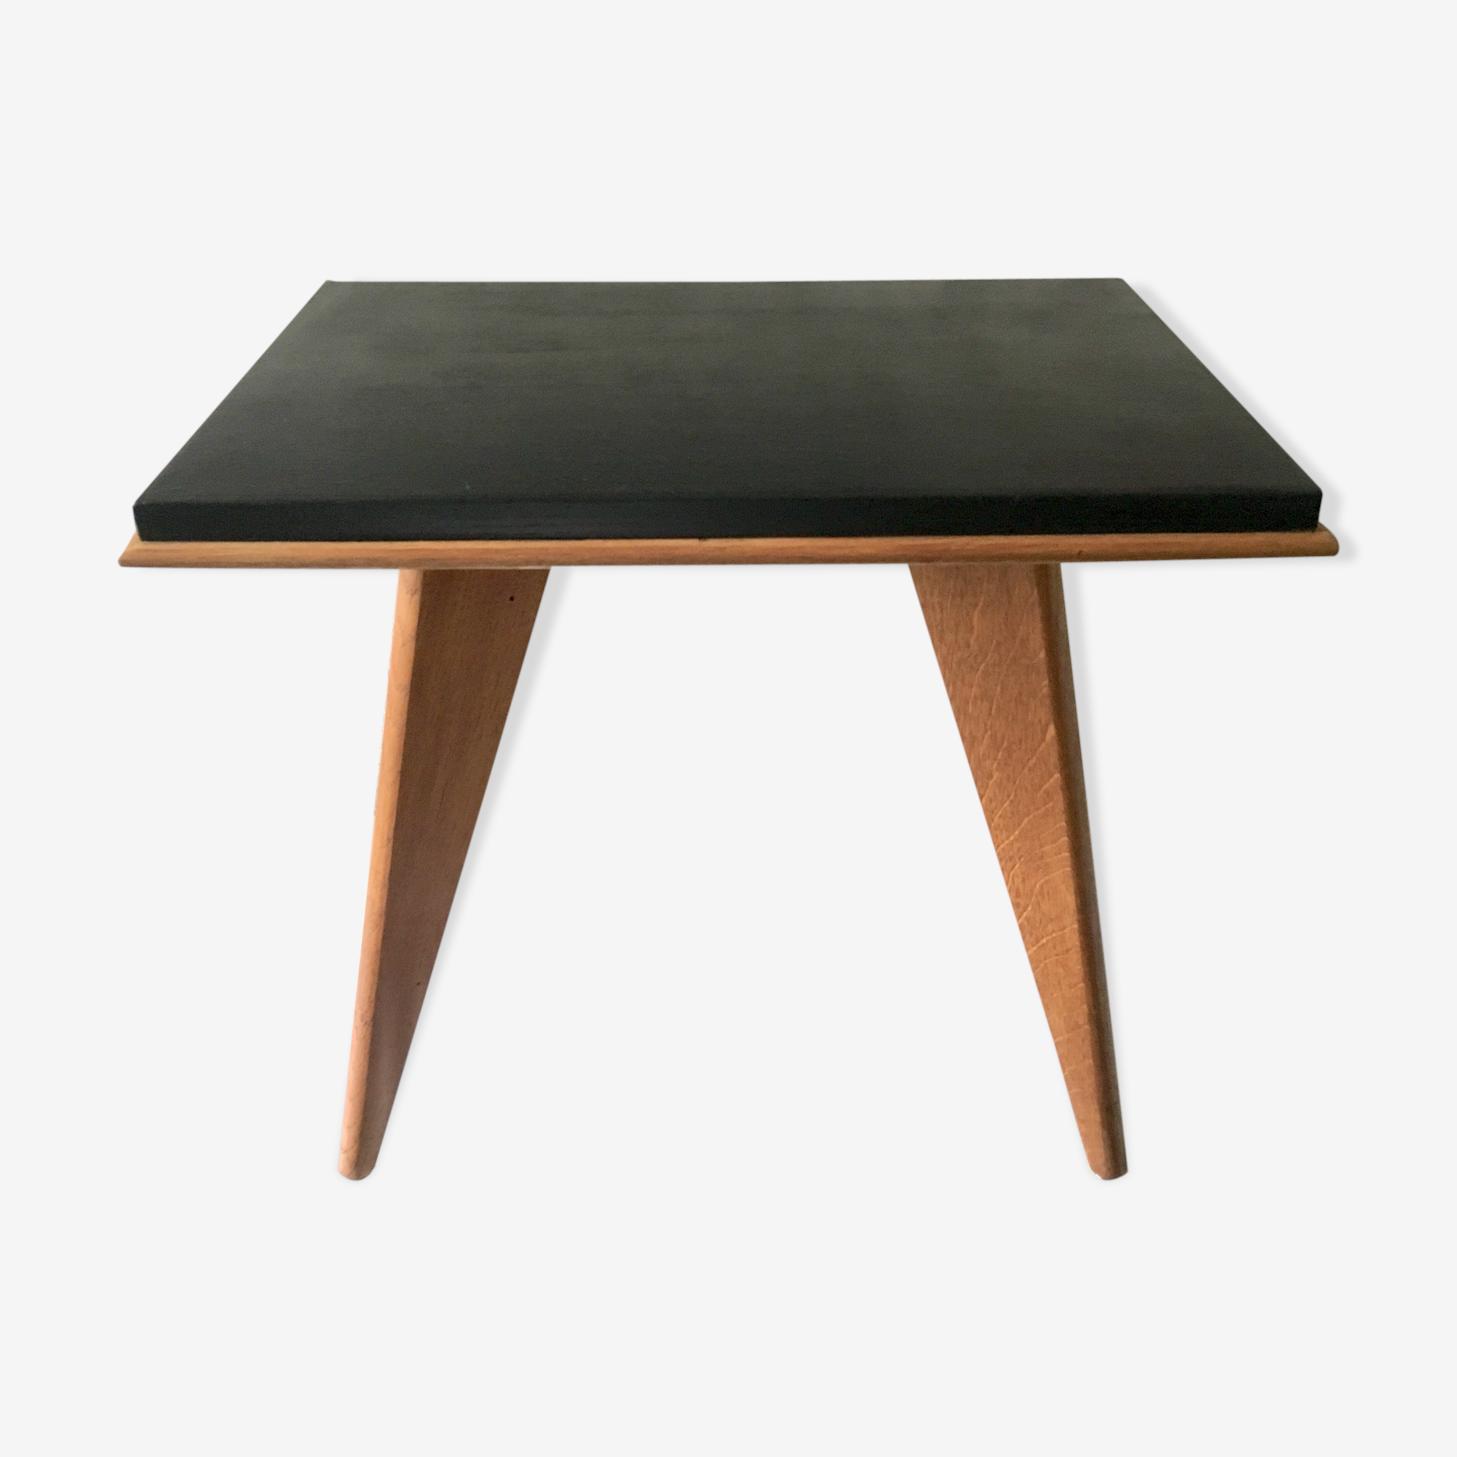 Table d'appoint vintage scandinave